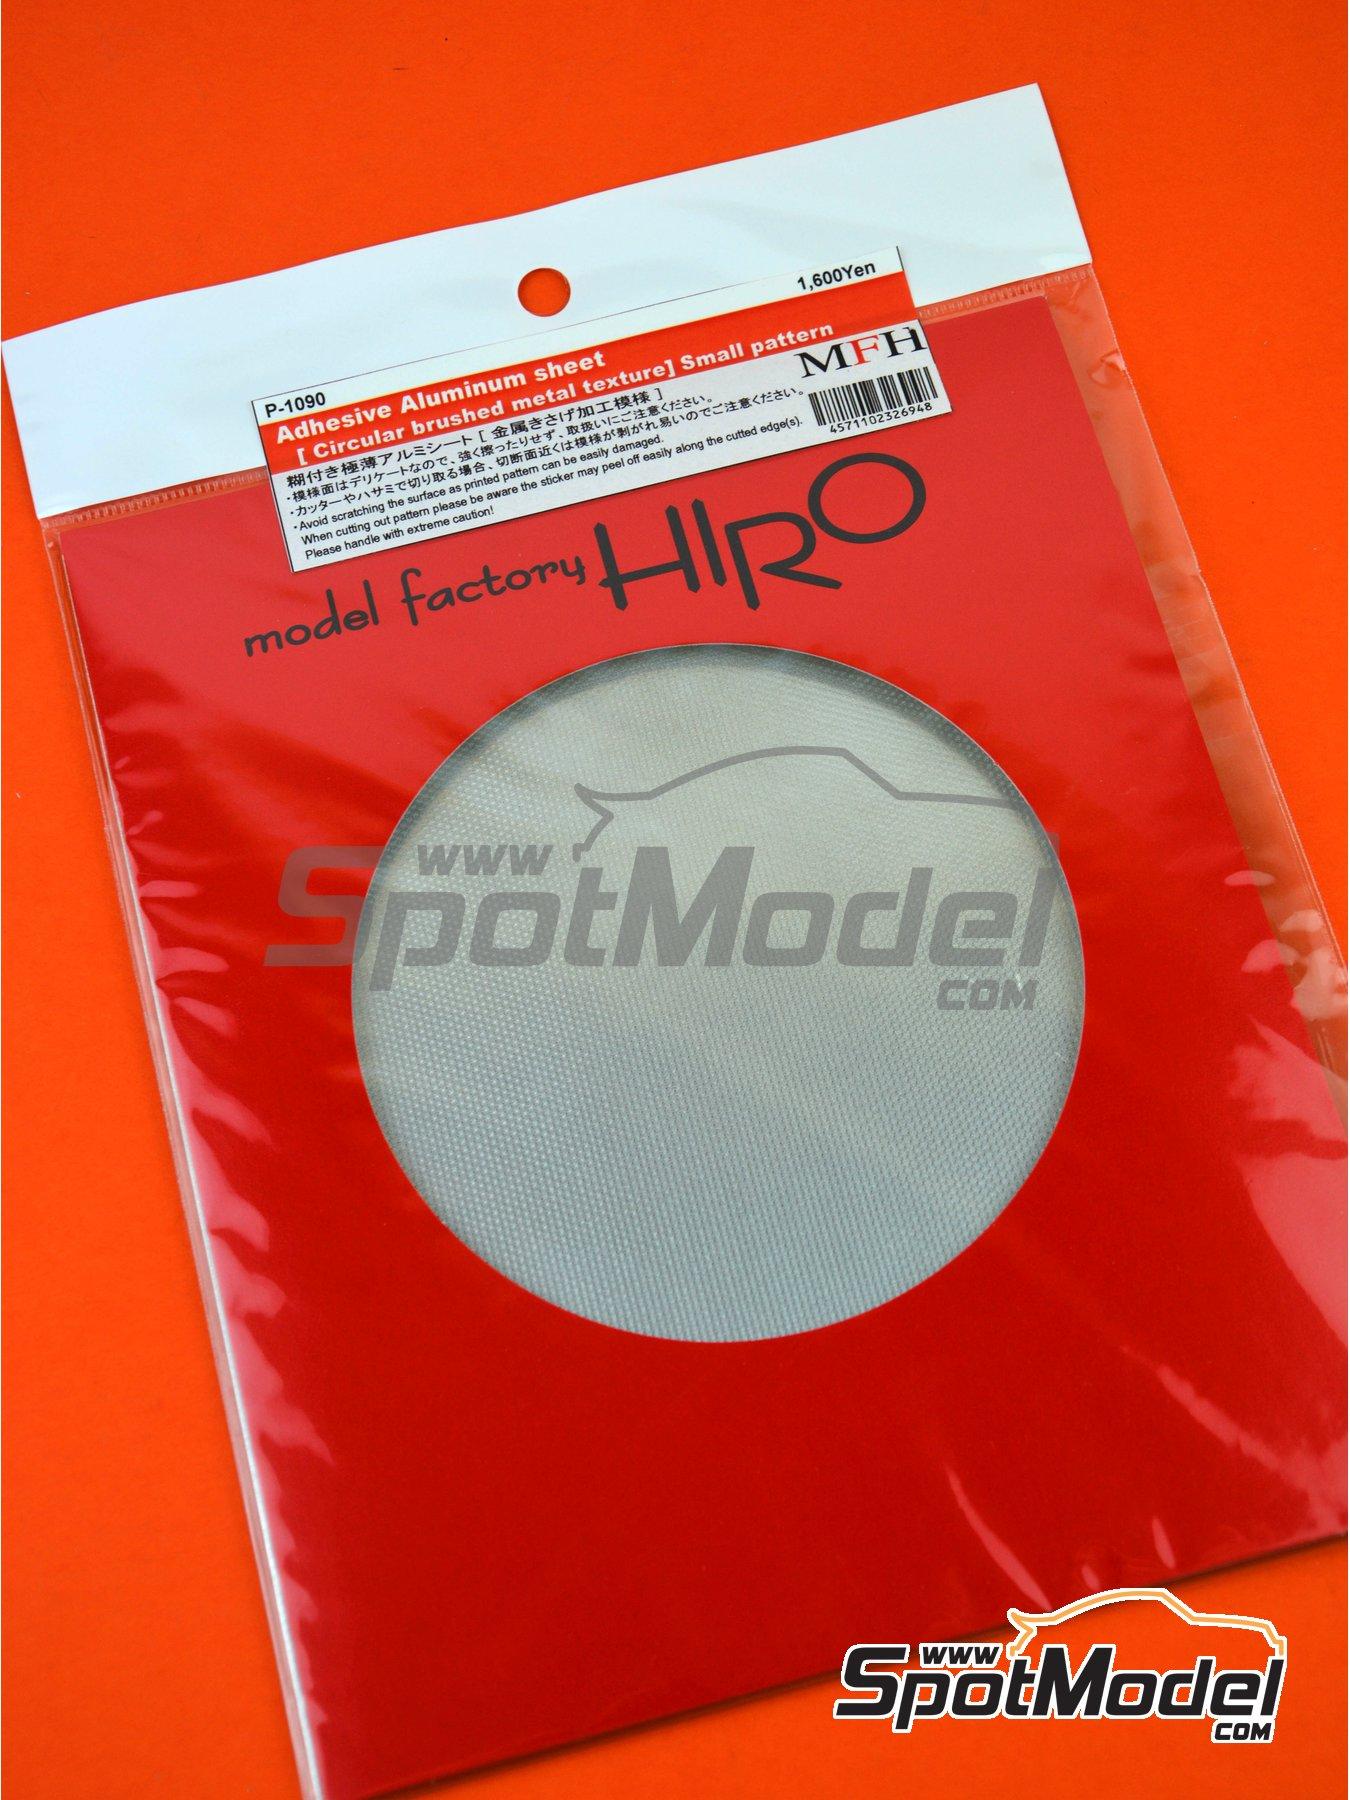 Aluminio con cepillado circular - trama pequeña | Material fabricado por Model Factory Hiro (ref.MFH-P1090) image